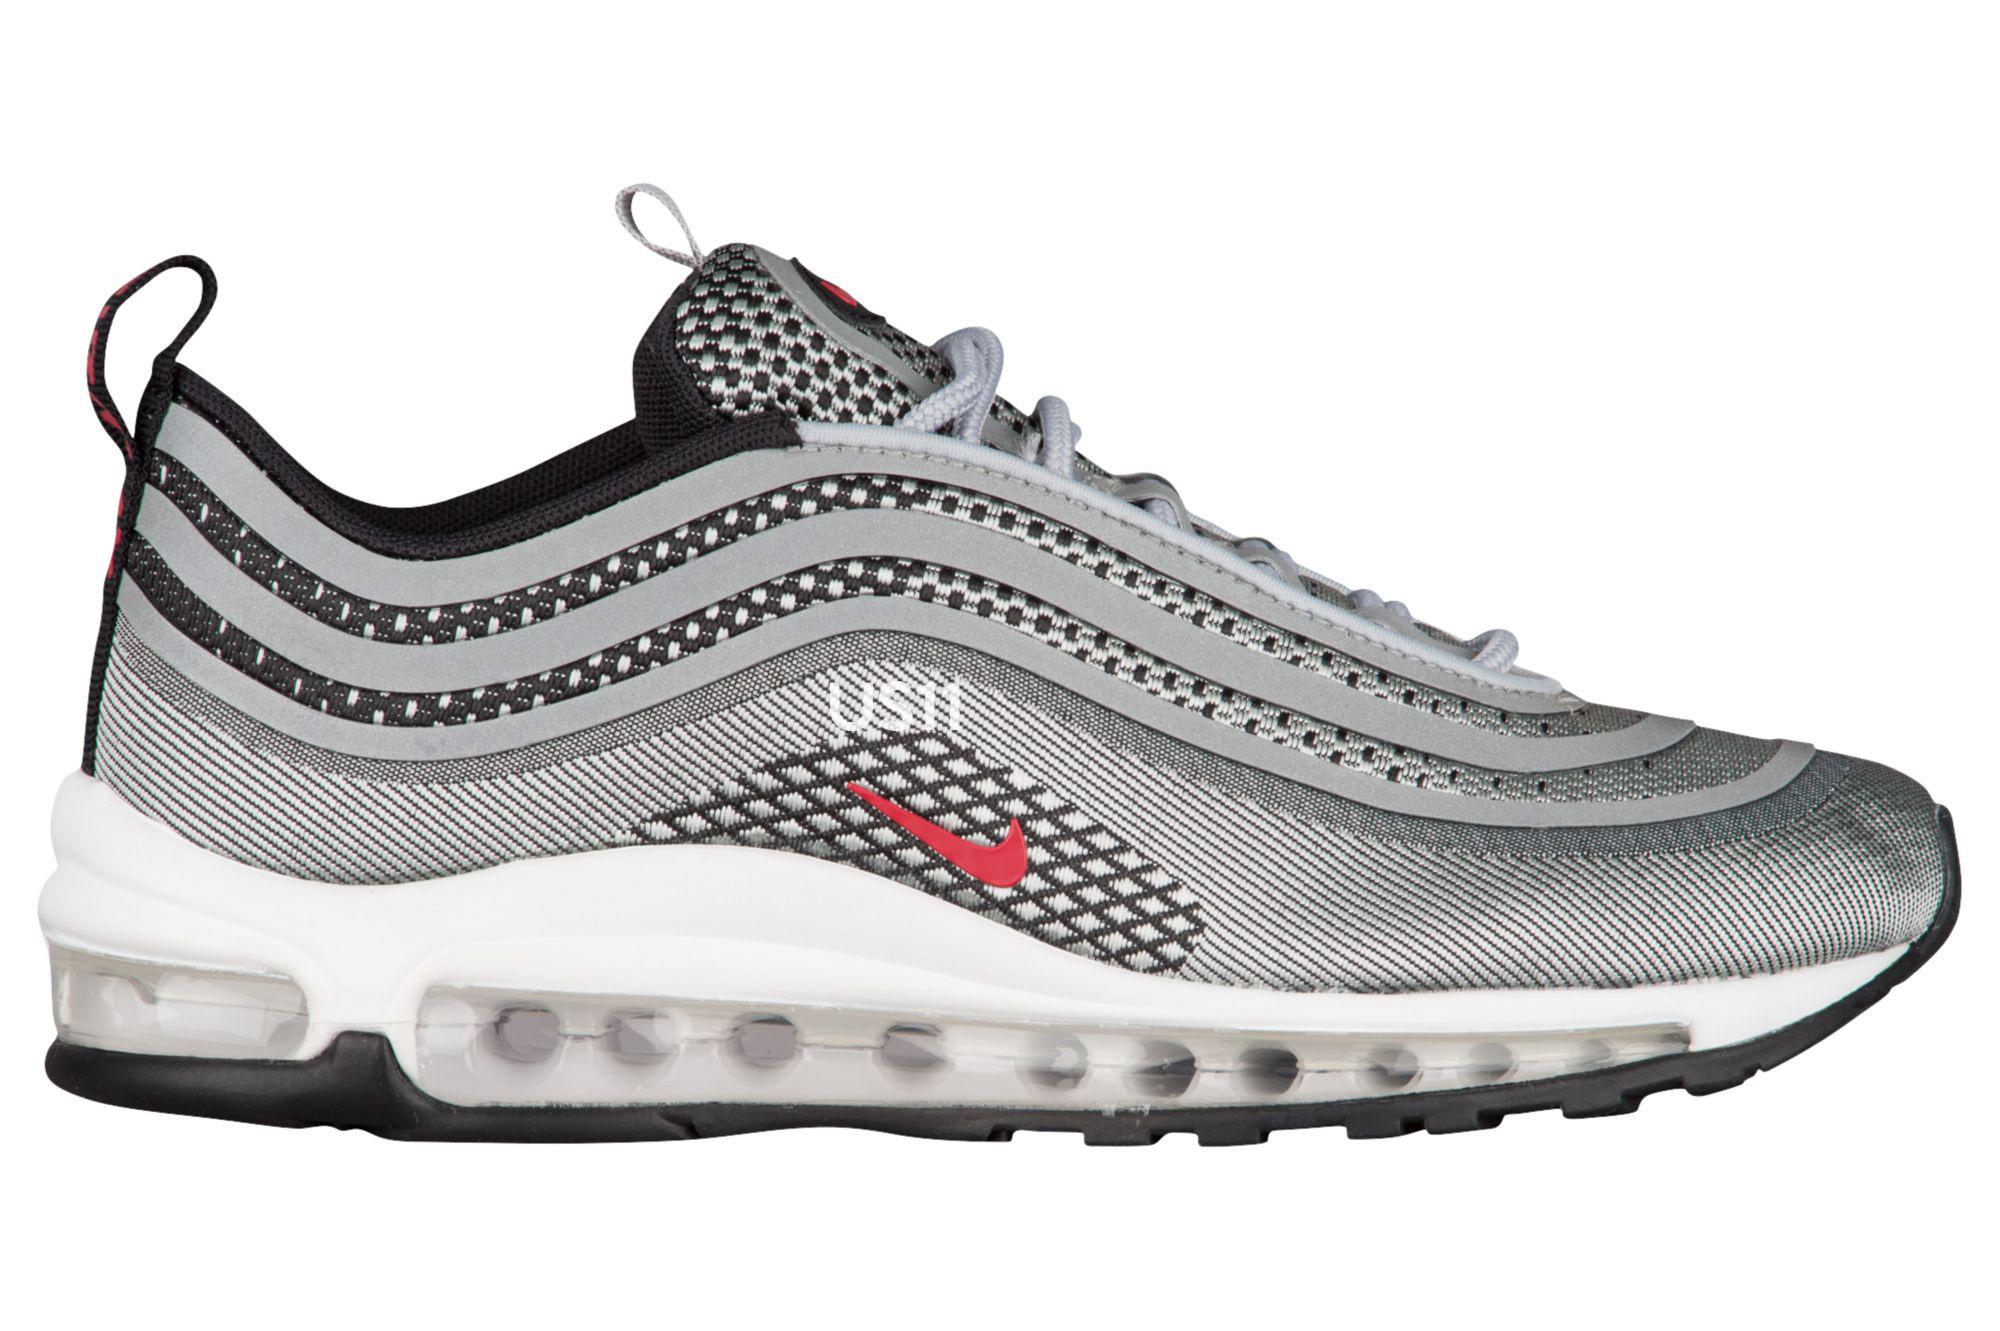 65747eb2f6 Kicks Off Court / Lifestyle / Nike / Retro Lifestyle / Runners ...